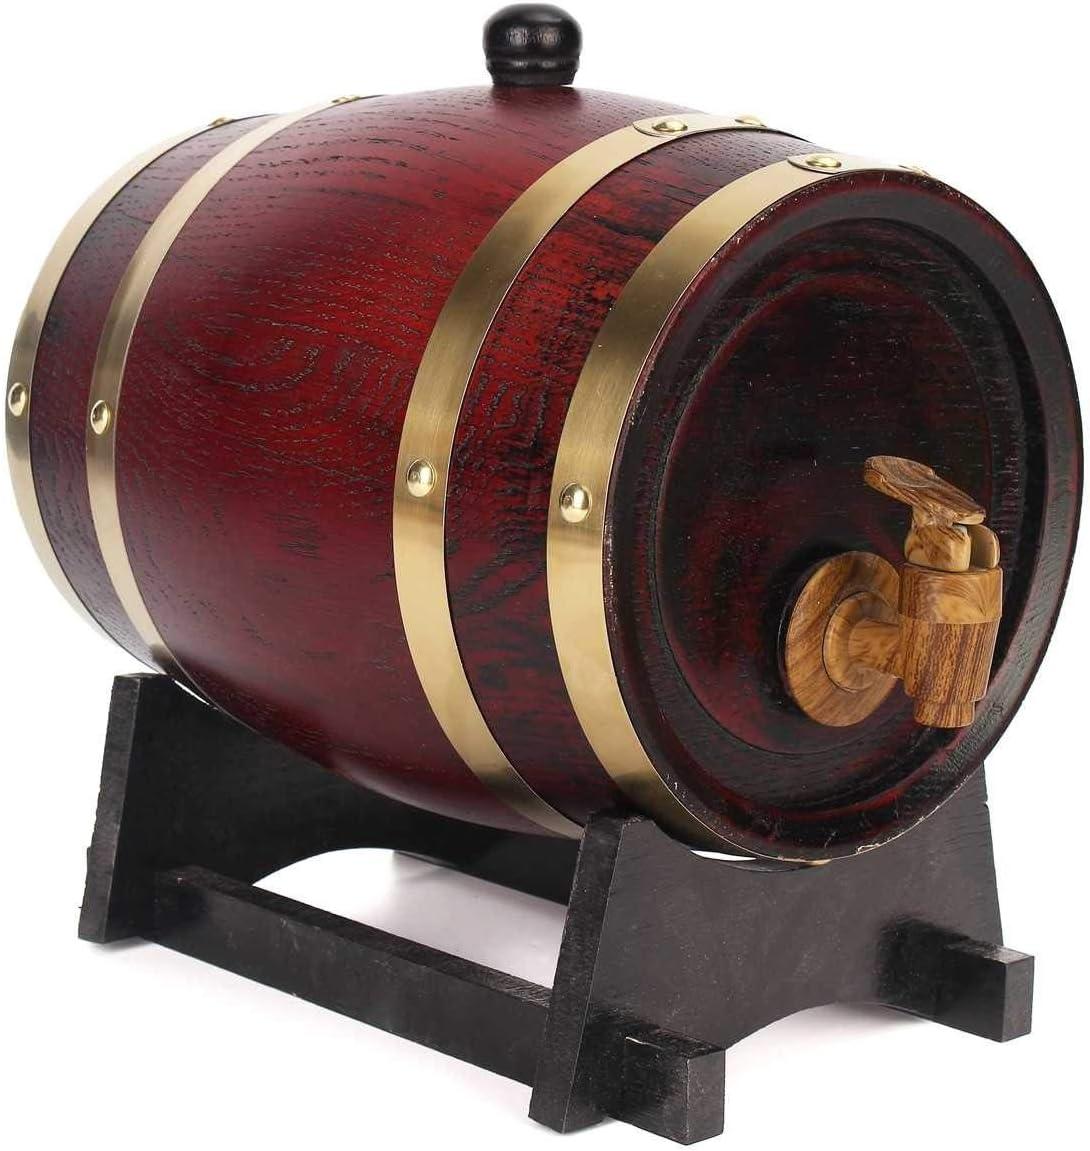 NO BRAND 1,5 l / 3L / 5L de Madera Barriles fermentación del Vino del Barril de la Madera de Roble elaborado Cerveza Vino Tinto Barril de Whisky Ron Brewing Barril Bar Accesorios